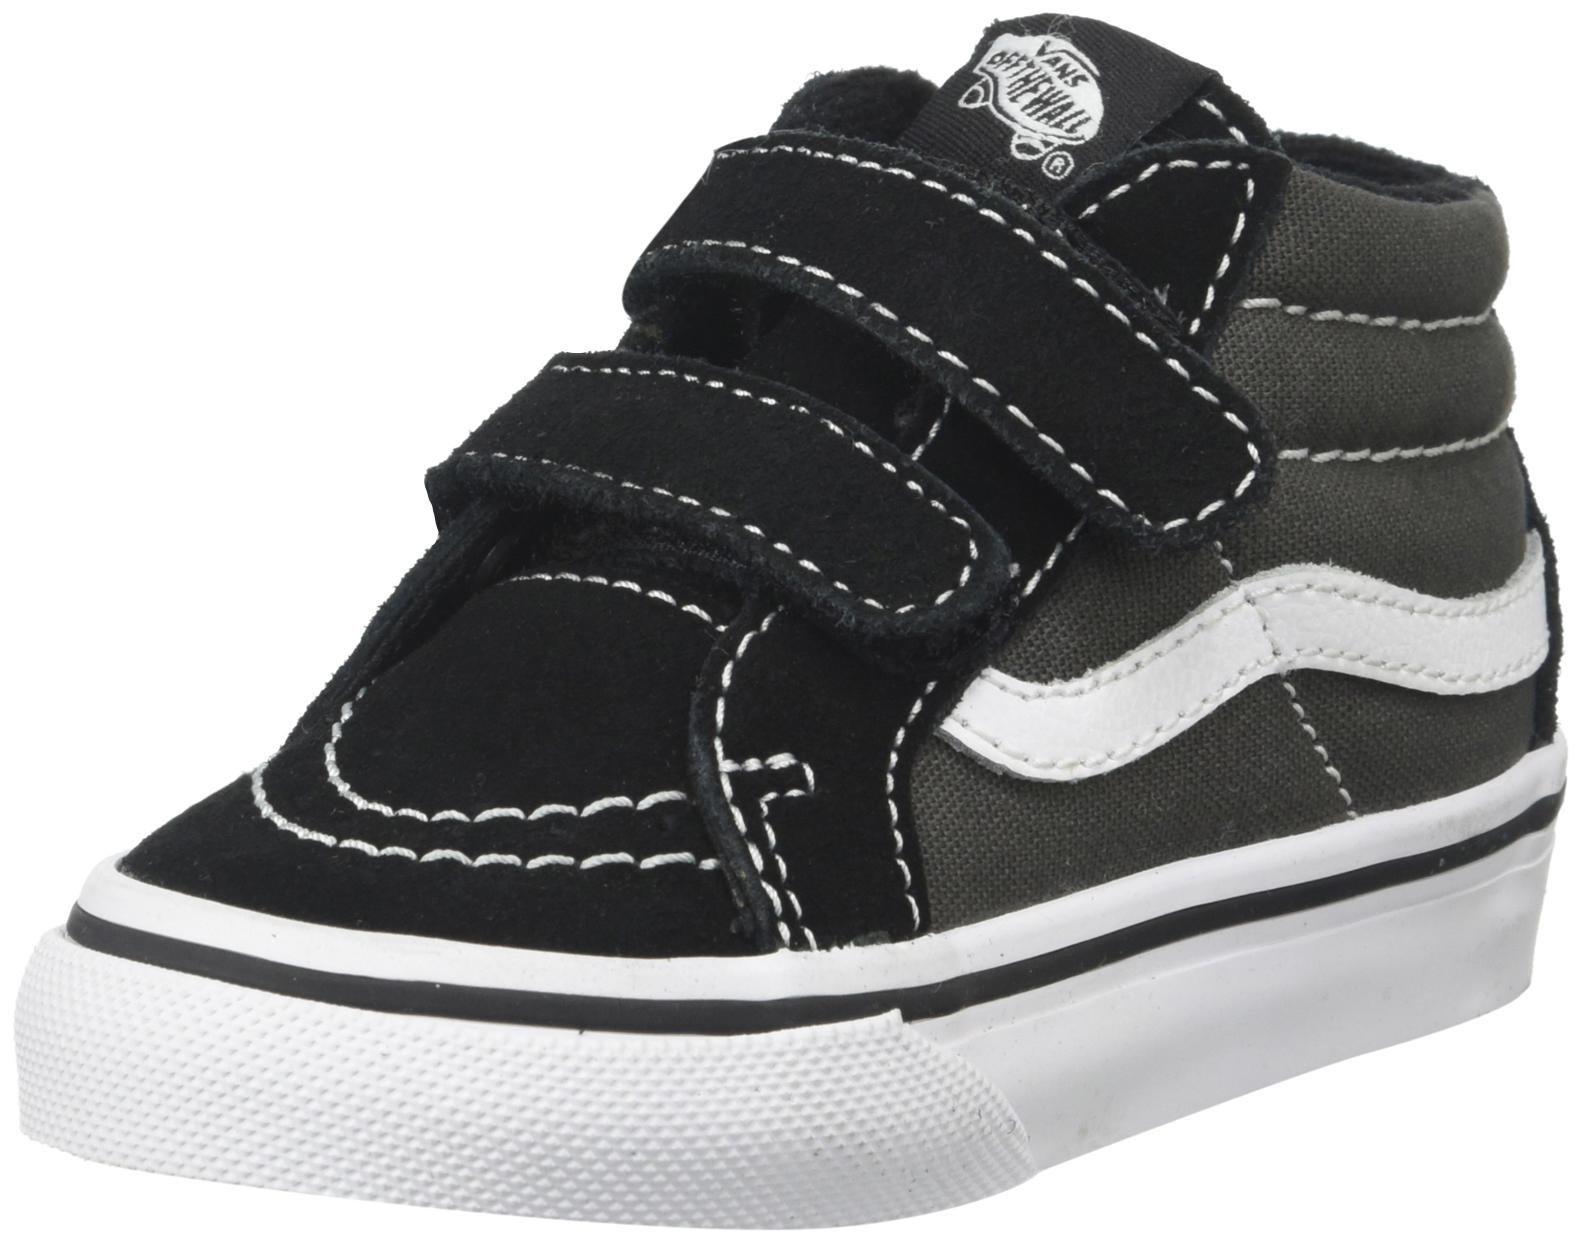 607b064544 Galleon - Vans Era Peanuts Snoopy Skate Shoe (Toddler 5